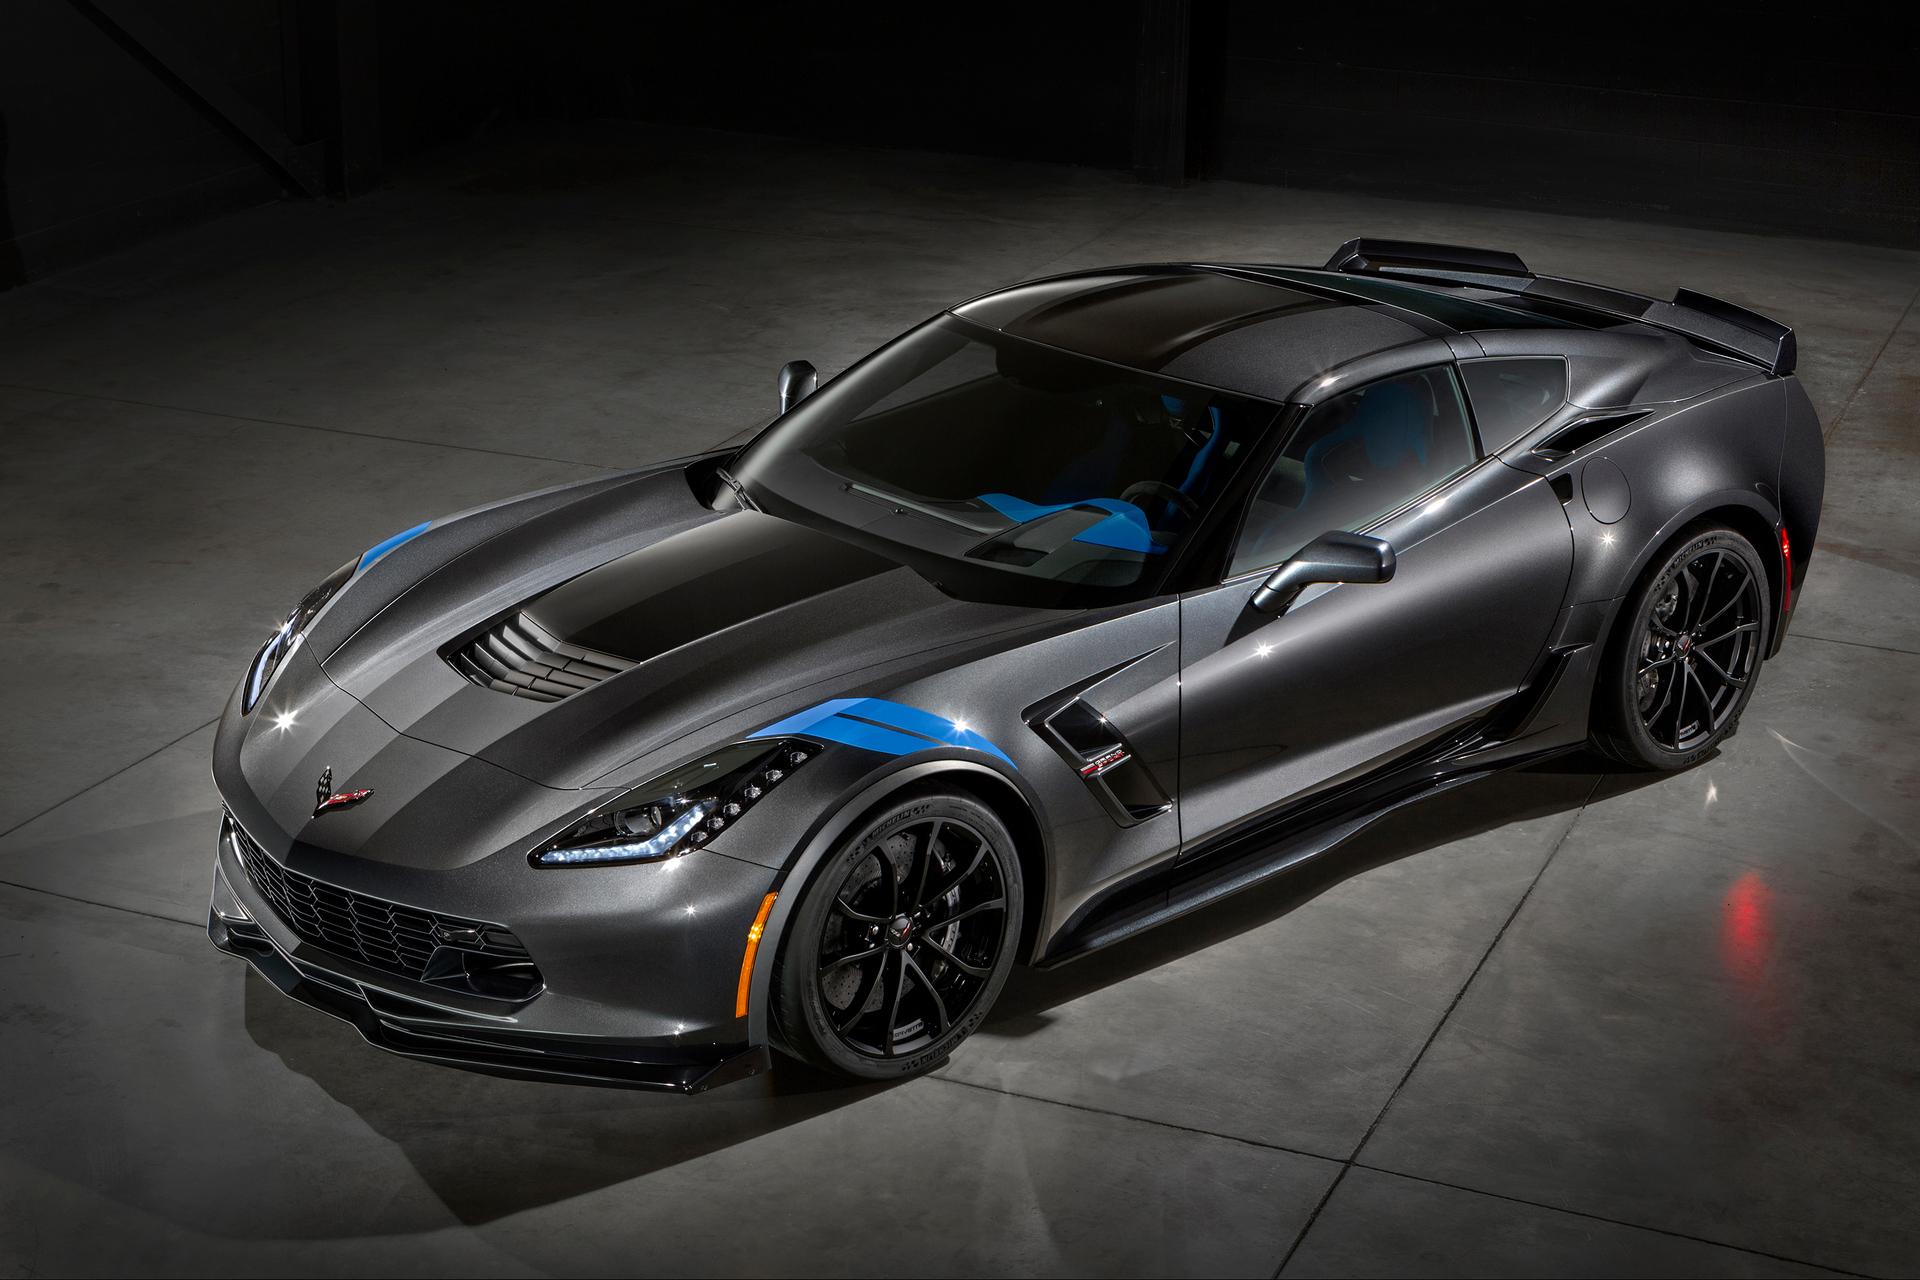 Awesome Carrrs Auto Portal U003e Trend U003e Rating U003e Most Popular American Sports Cars U003e  2017 Chevrolet Corvette Grand Sport © General Motors